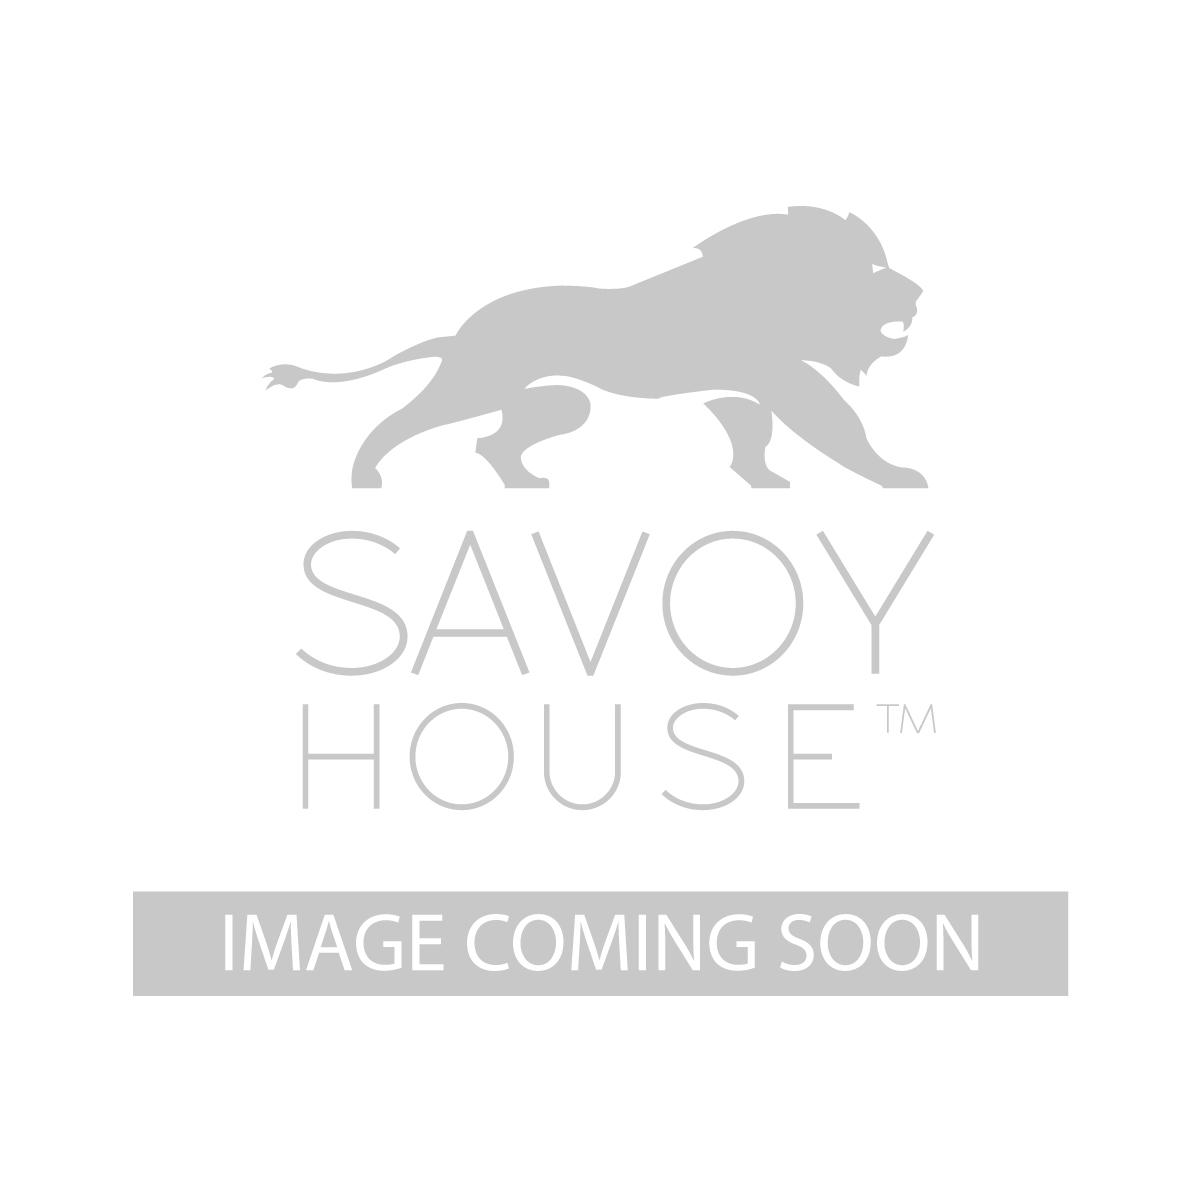 9 9065 1 67 Dunbar 1 Light Wall Sconce By Savoy House